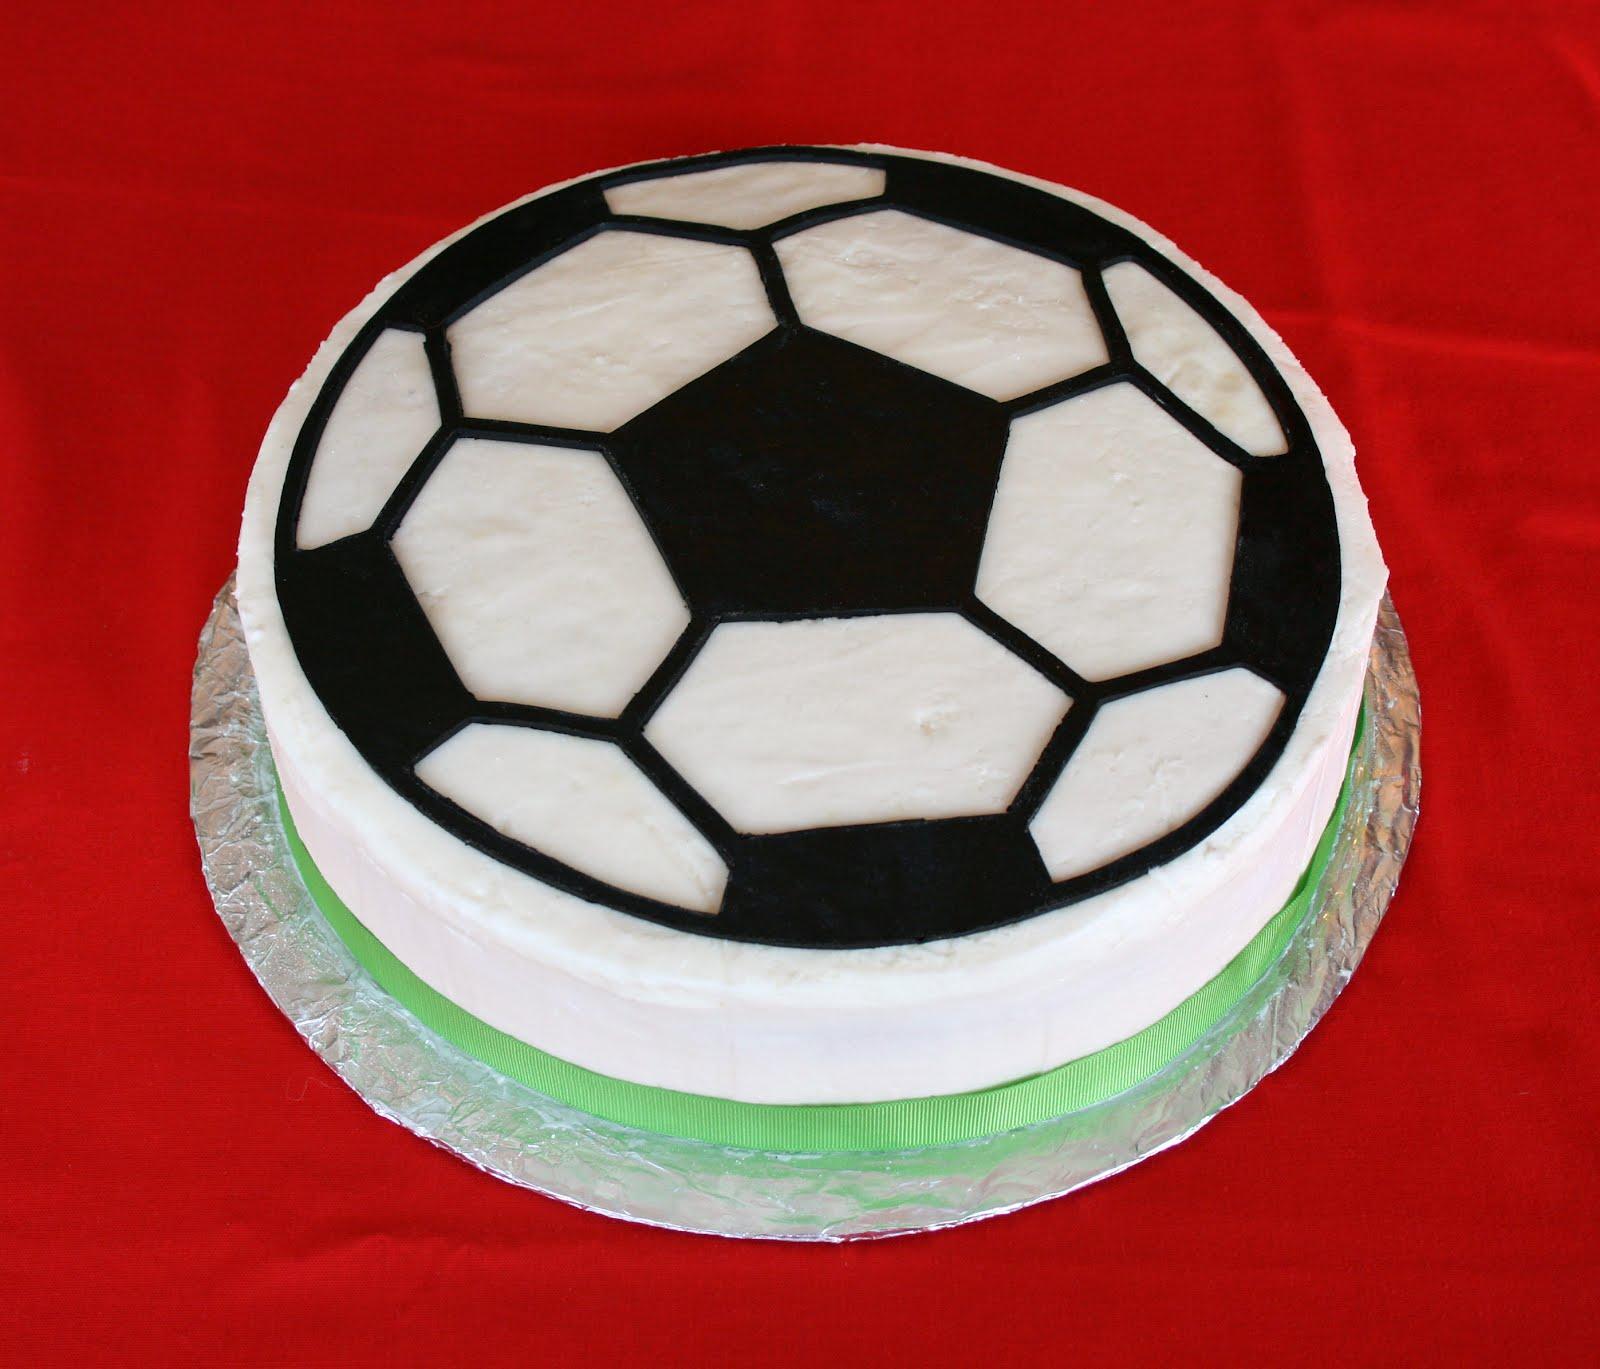 Images Of Soccer Ball Cake : paper owl {cassie d ambrosio}: Soccer Ball Cake